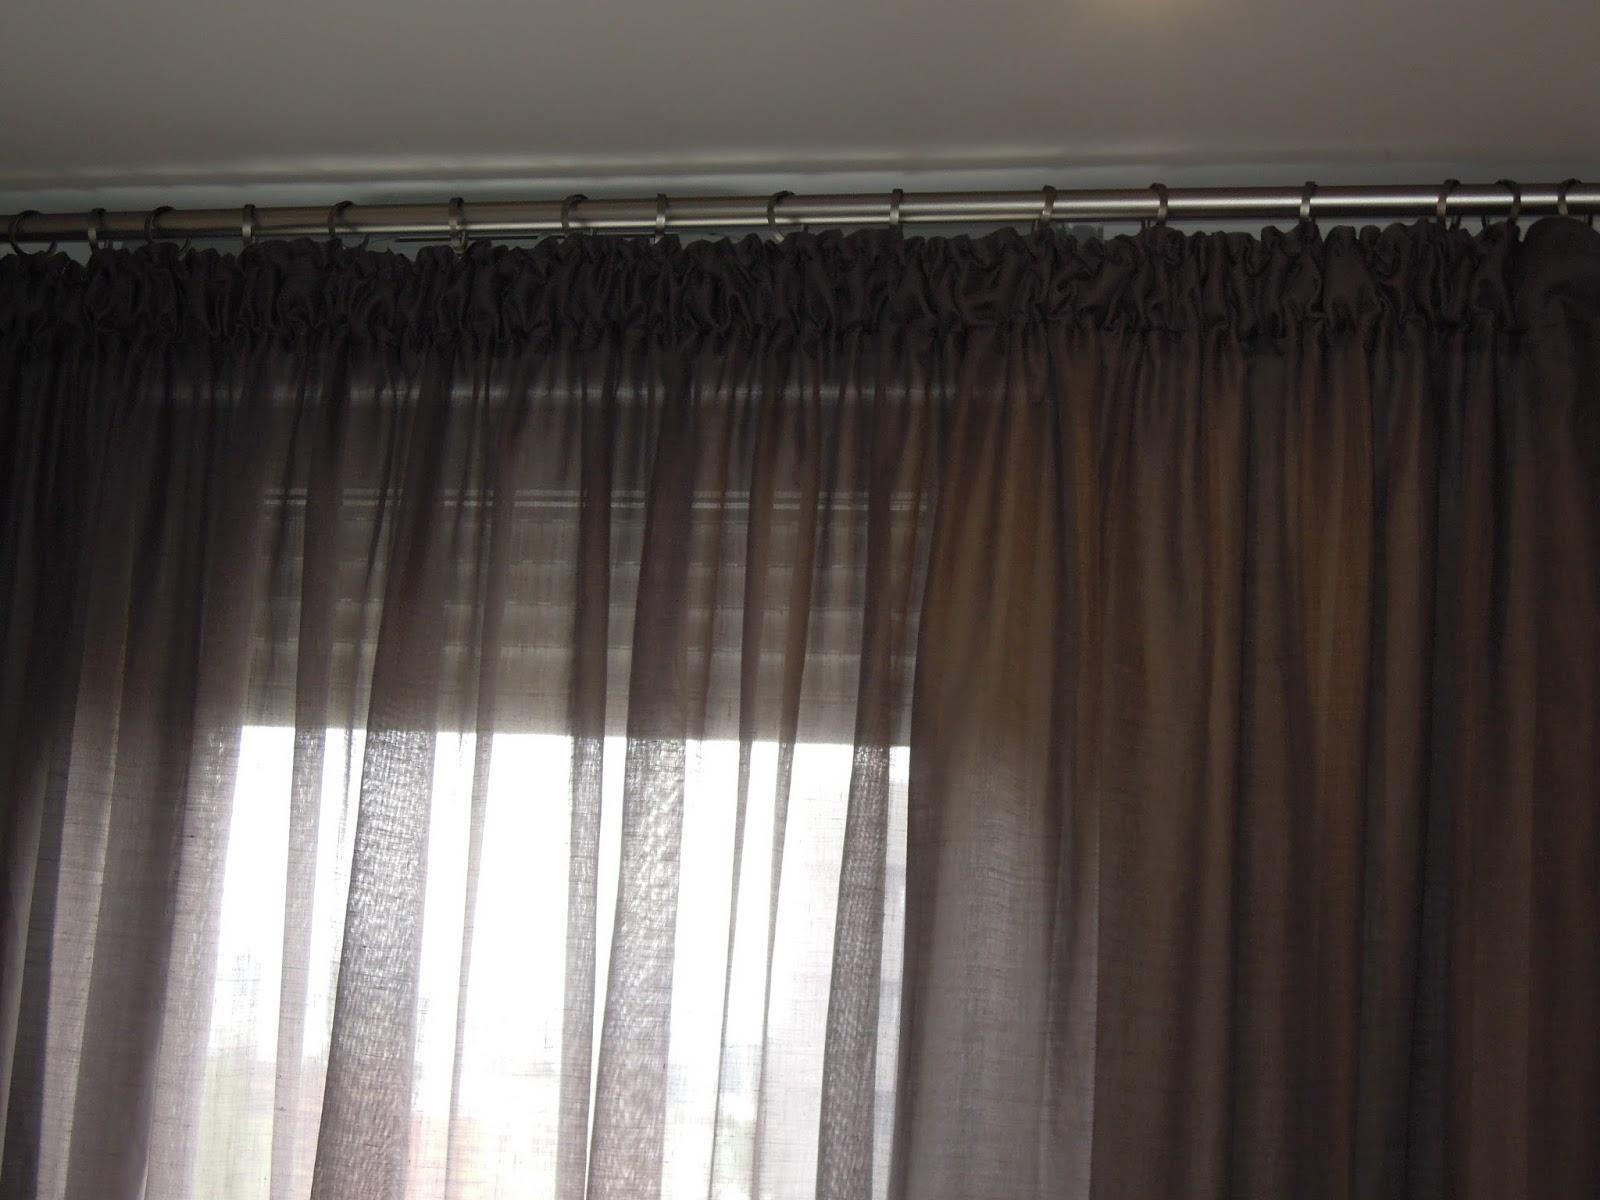 Fotos de cortinas como elegir unas cortinas aqu os ense o distintos modelos para saber - Tipos de cintas para cortinas ...